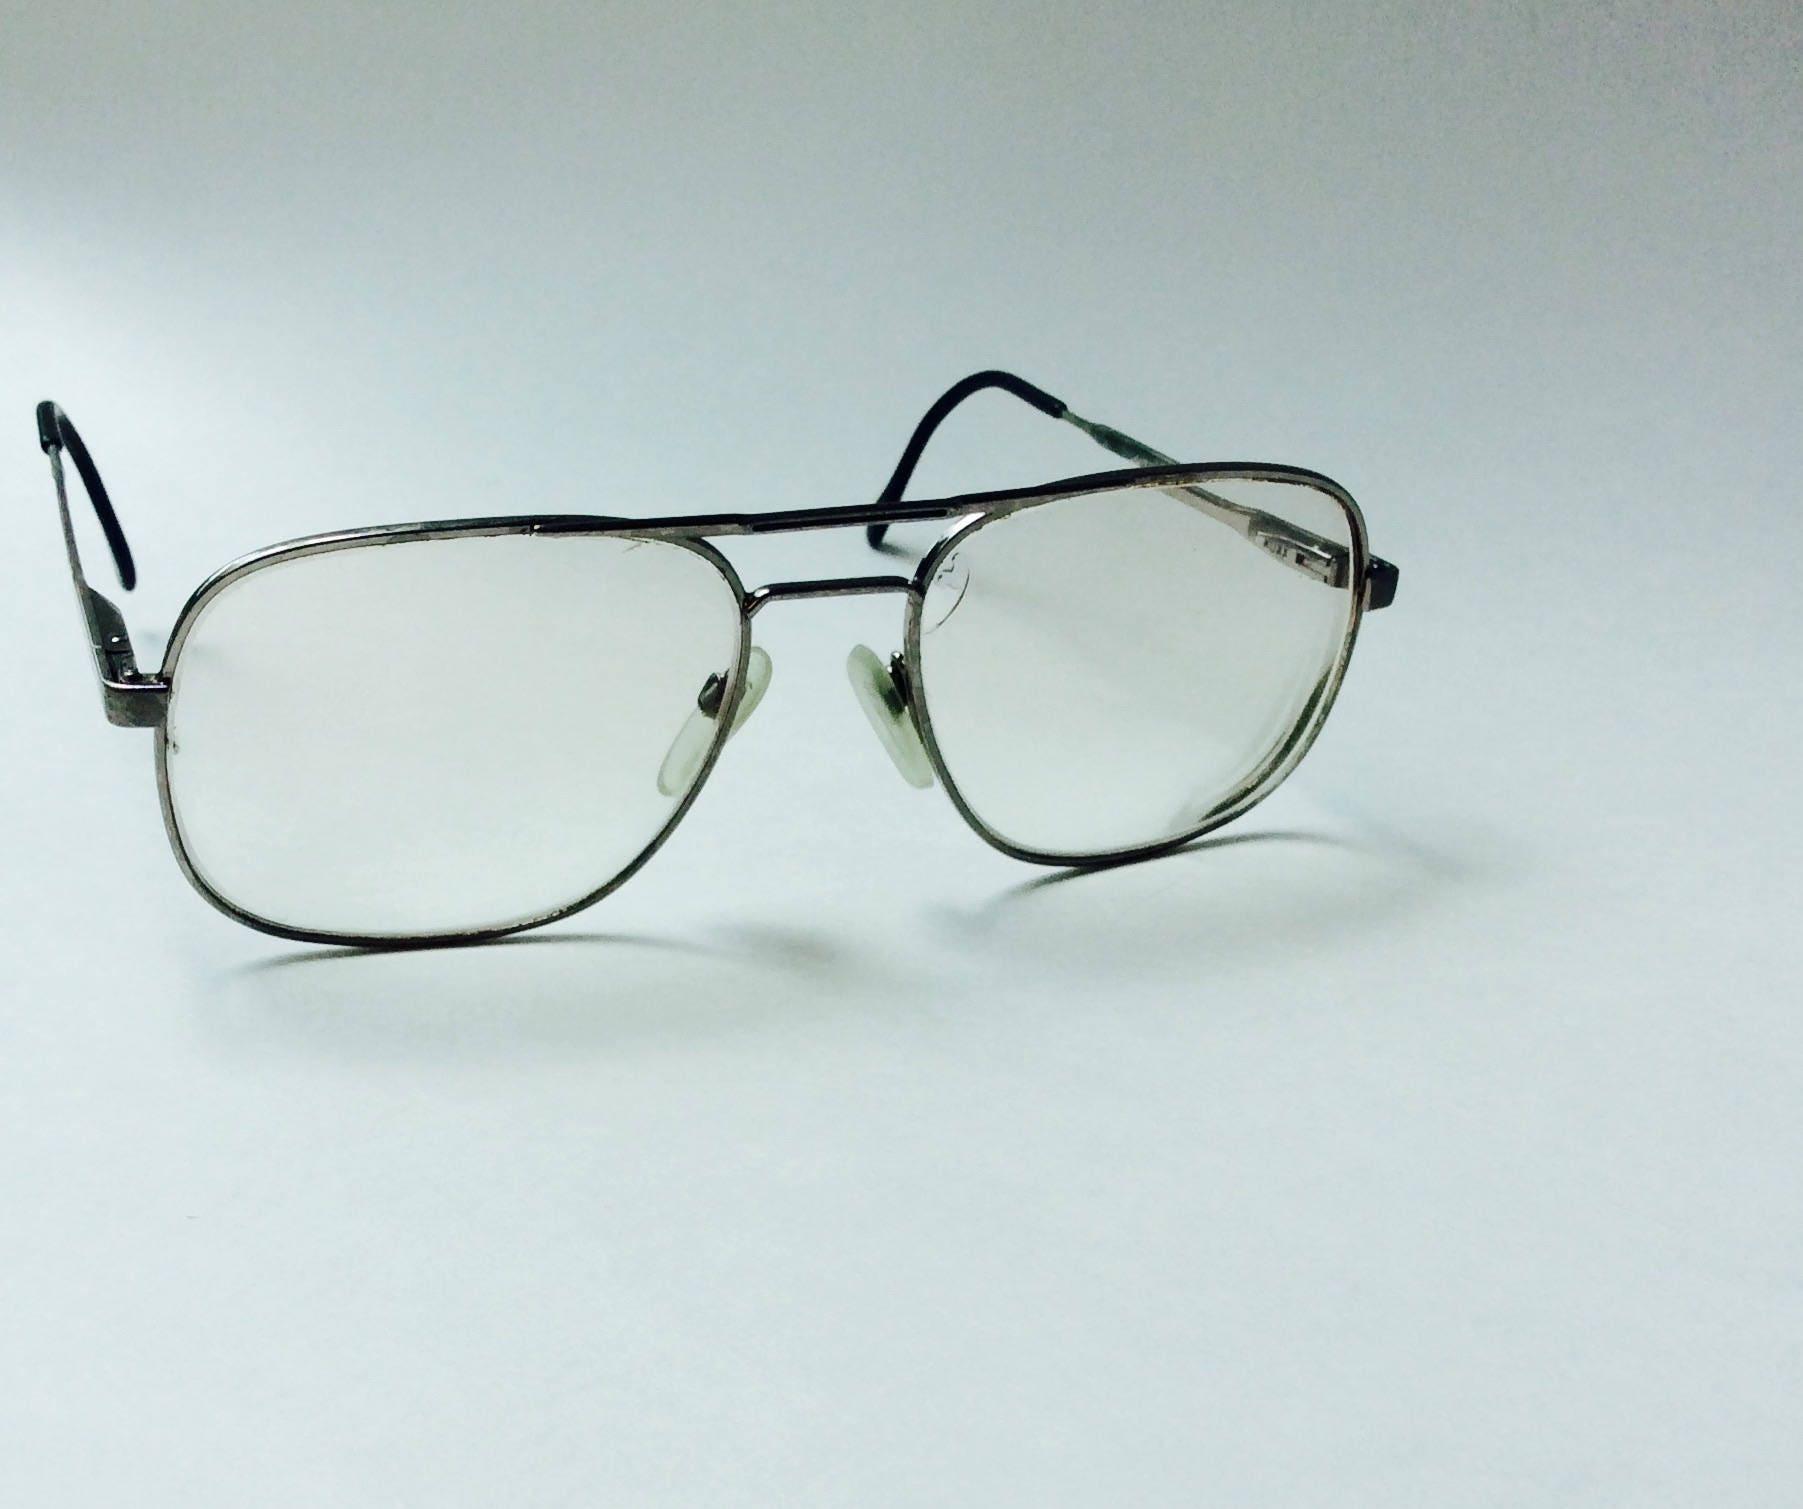 Luxottica KLIXX Aviator Style Eyeglasses Vintage Eyewear 140